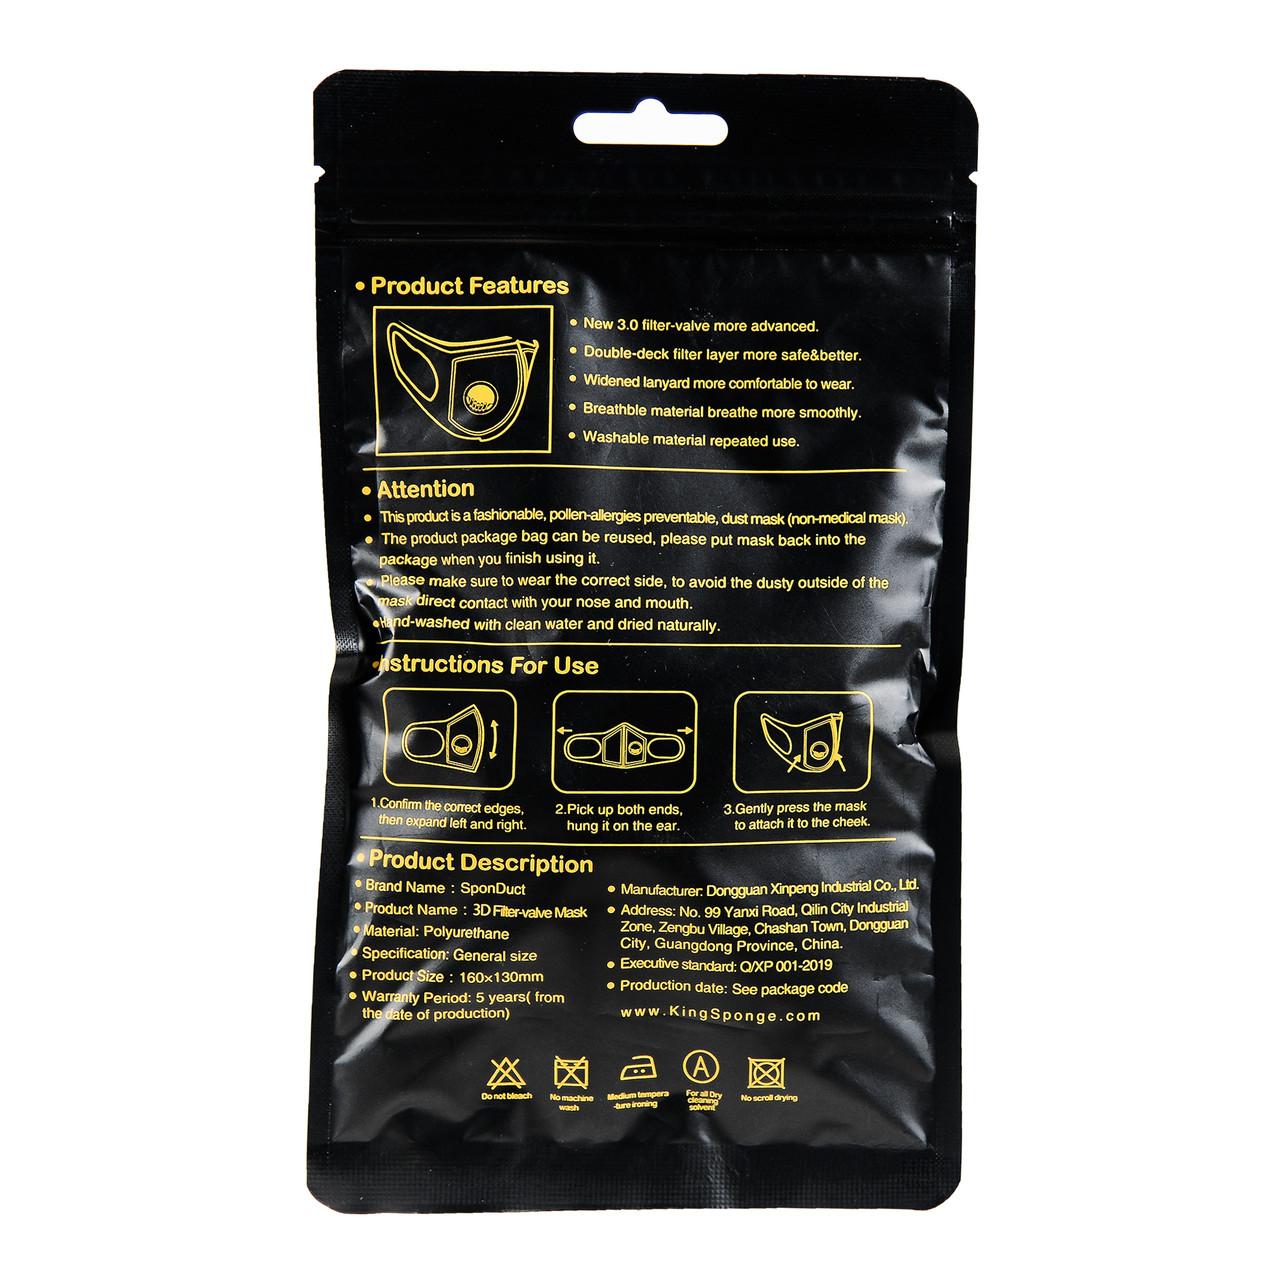 Black Comfort Sponge Face Mask with Air Valve - 3 Pack